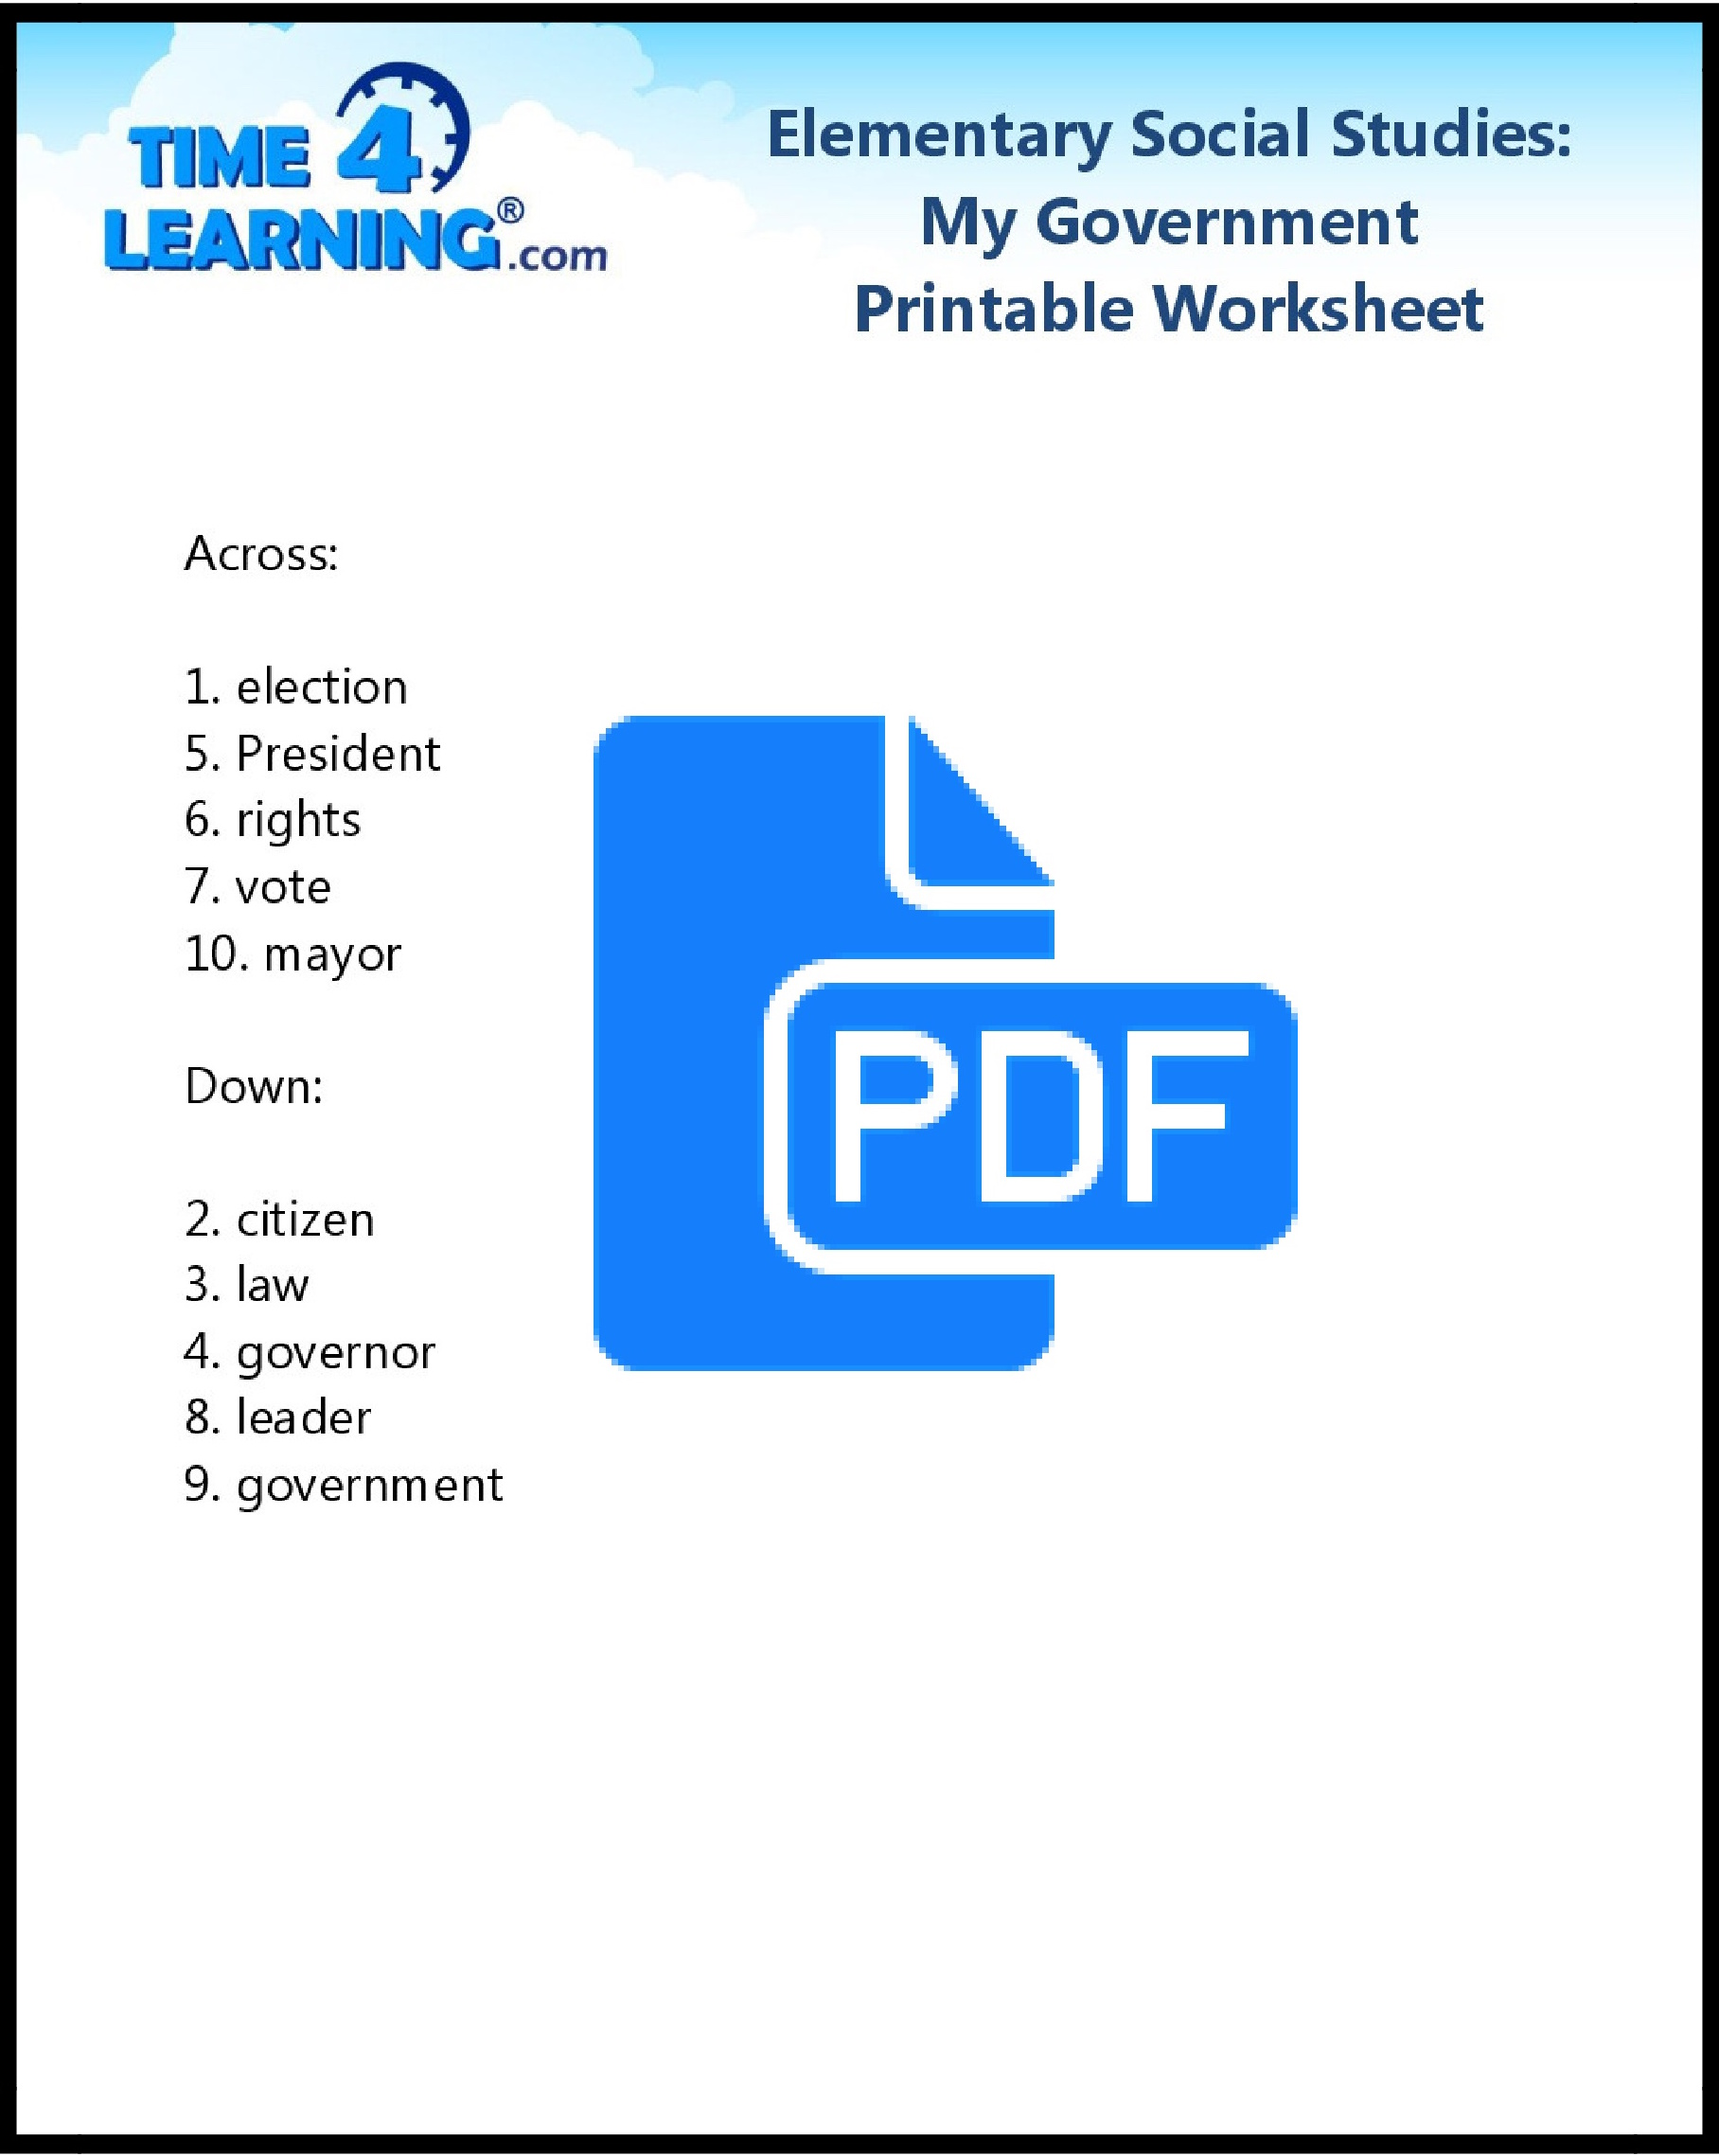 hight resolution of Free Printable: Elementary Social Studies Worksheet   Time4Learning